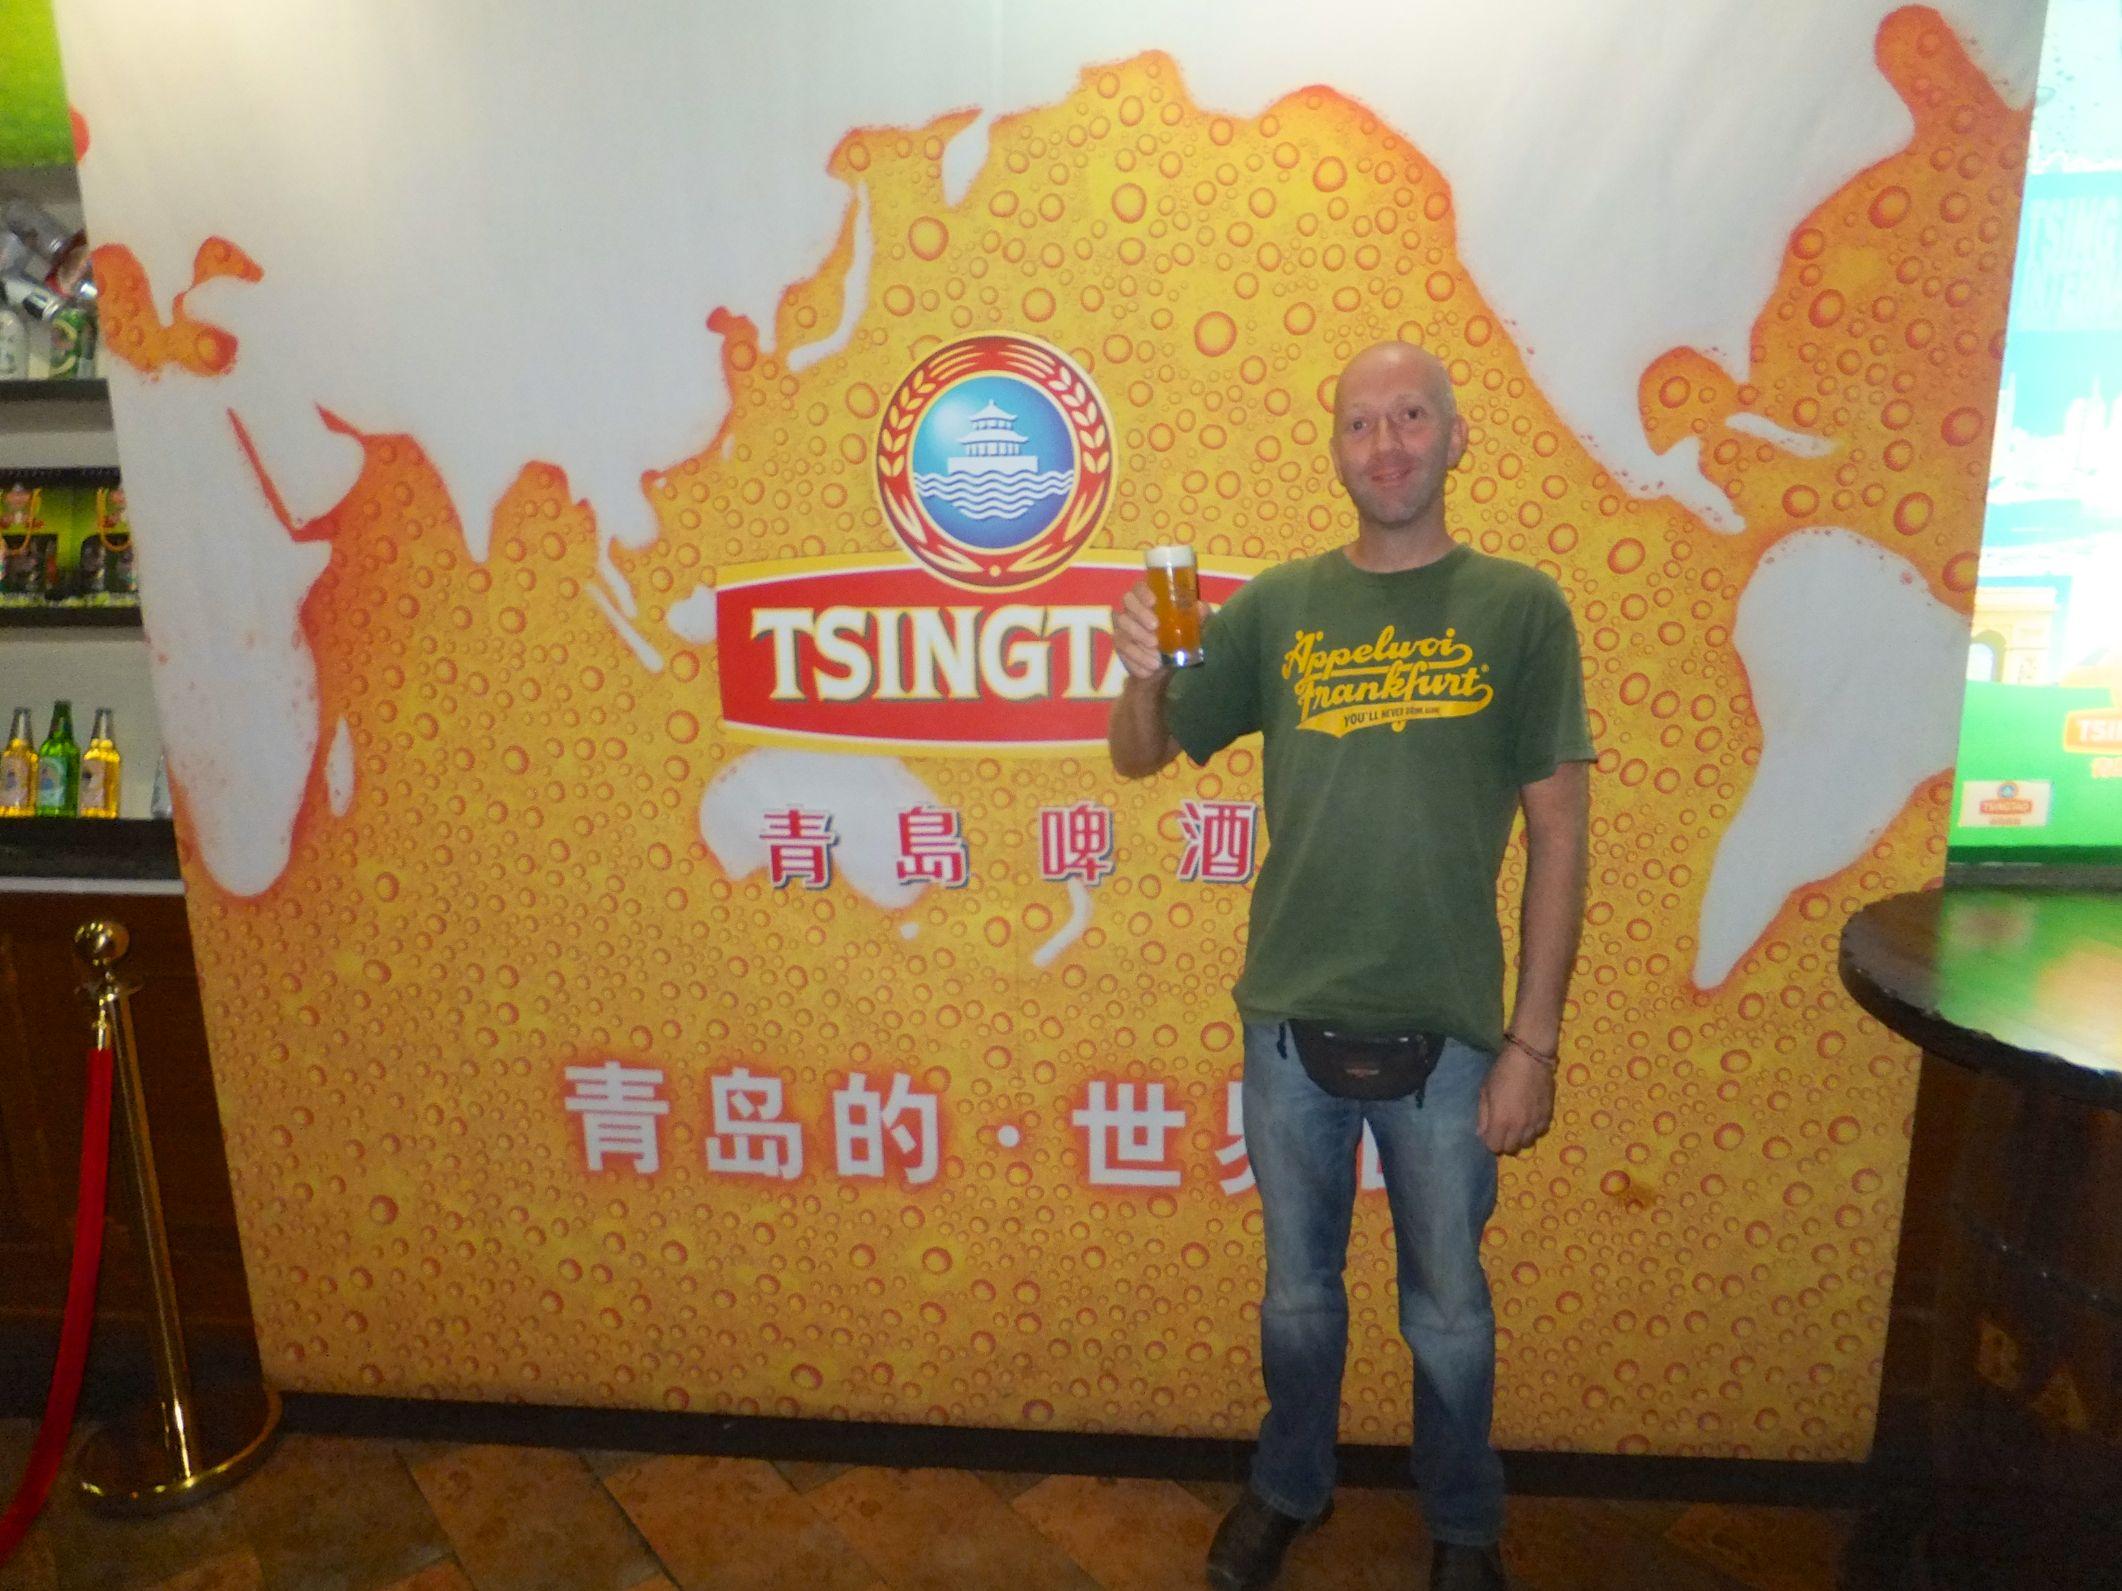 Auf den Spuren deutscher Kolonialherrschaft in China – Qingdao